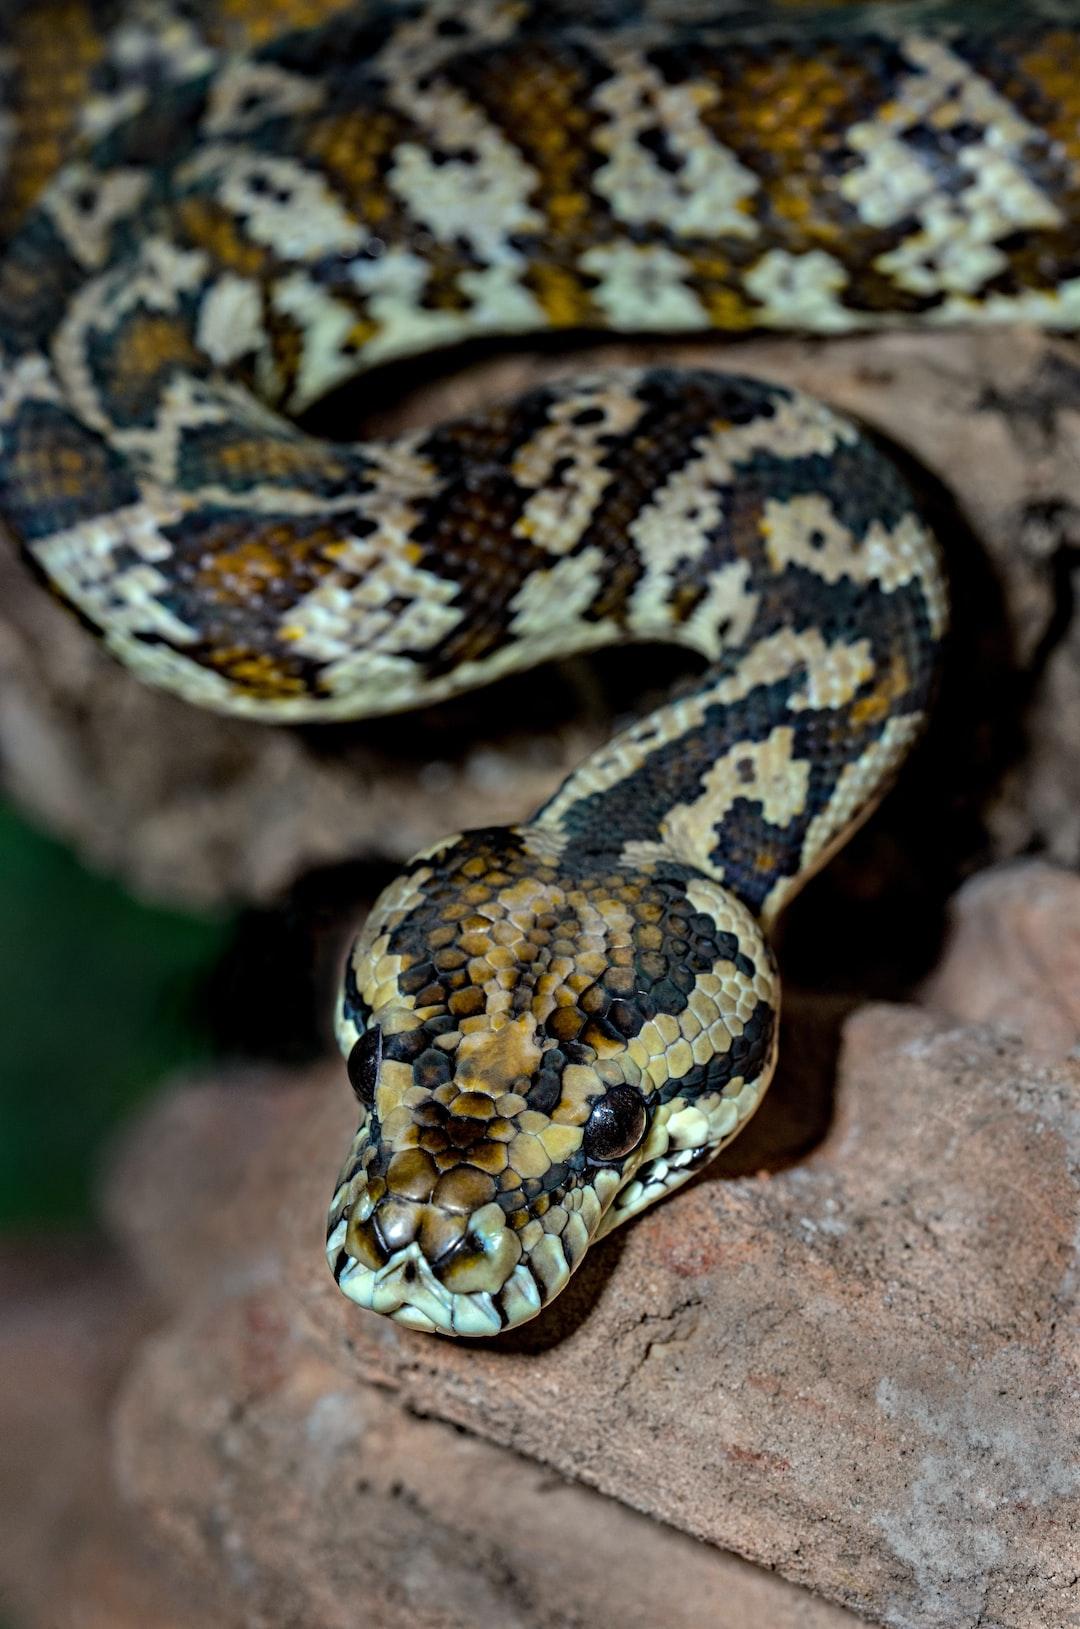 The pretty Darwin colour form of the carpet python Morelia spiloata.